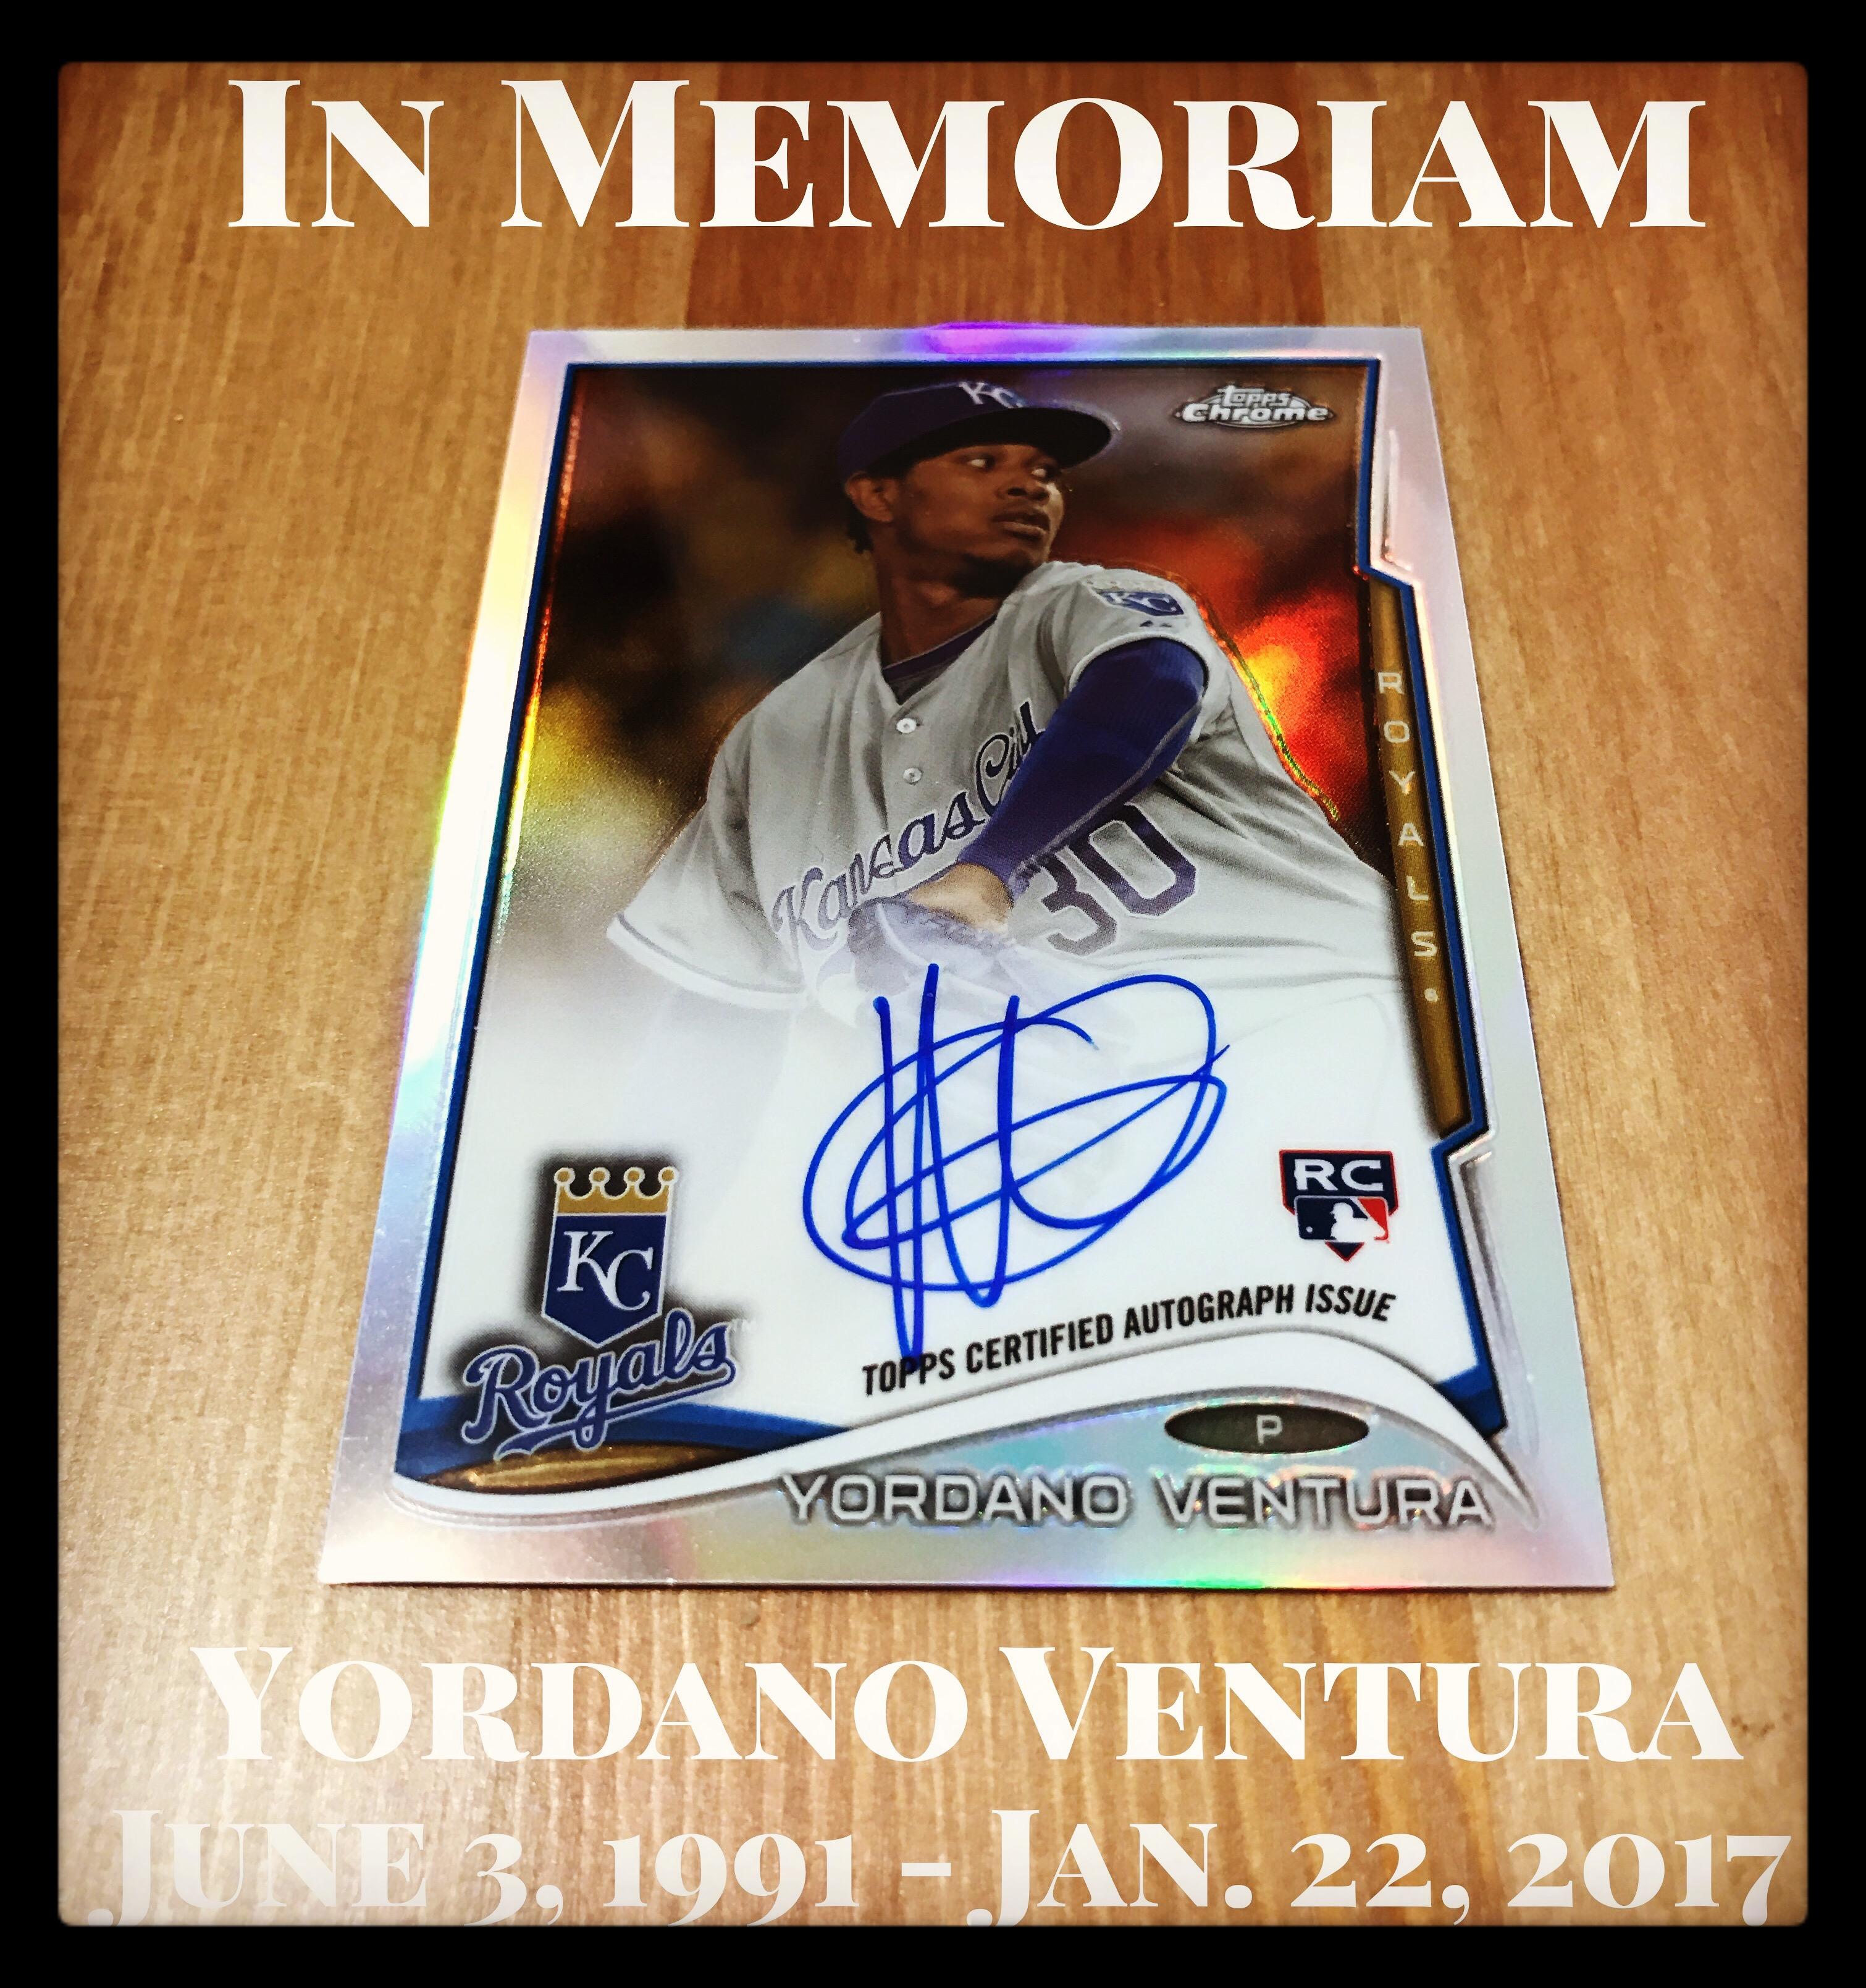 acf38fe787b In Memoriam  Yordano Ventura 6 3 91-1 22 17